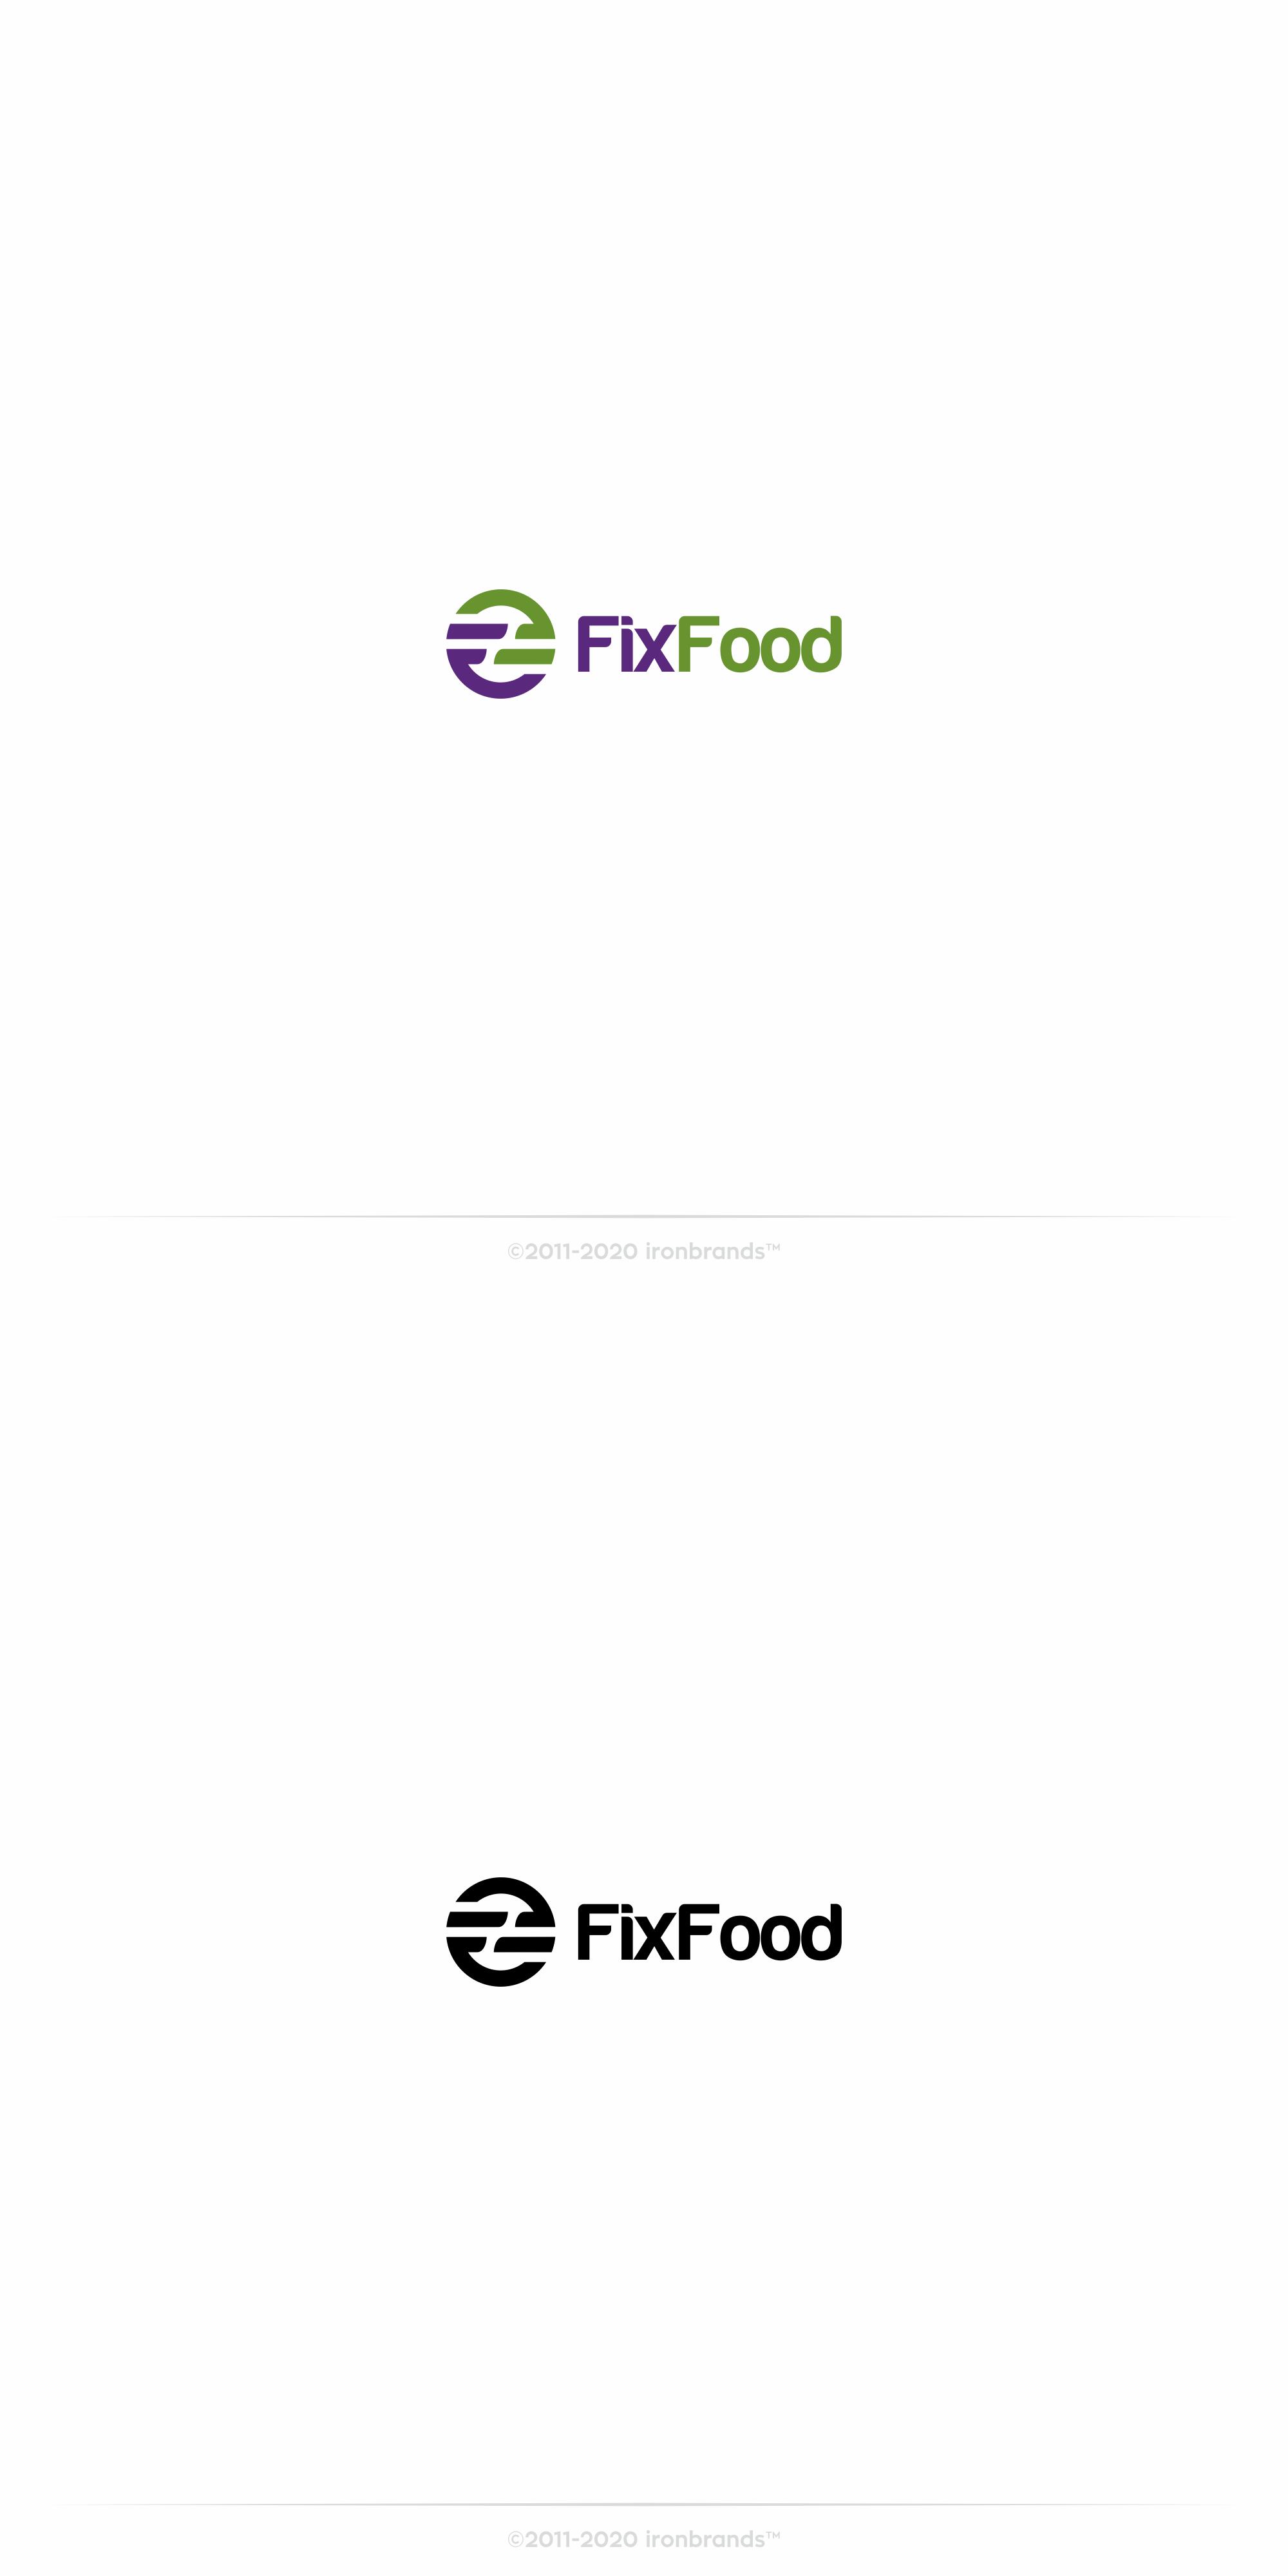 Логотип для доставки еды фото f_9205ecaade95f15f.jpg